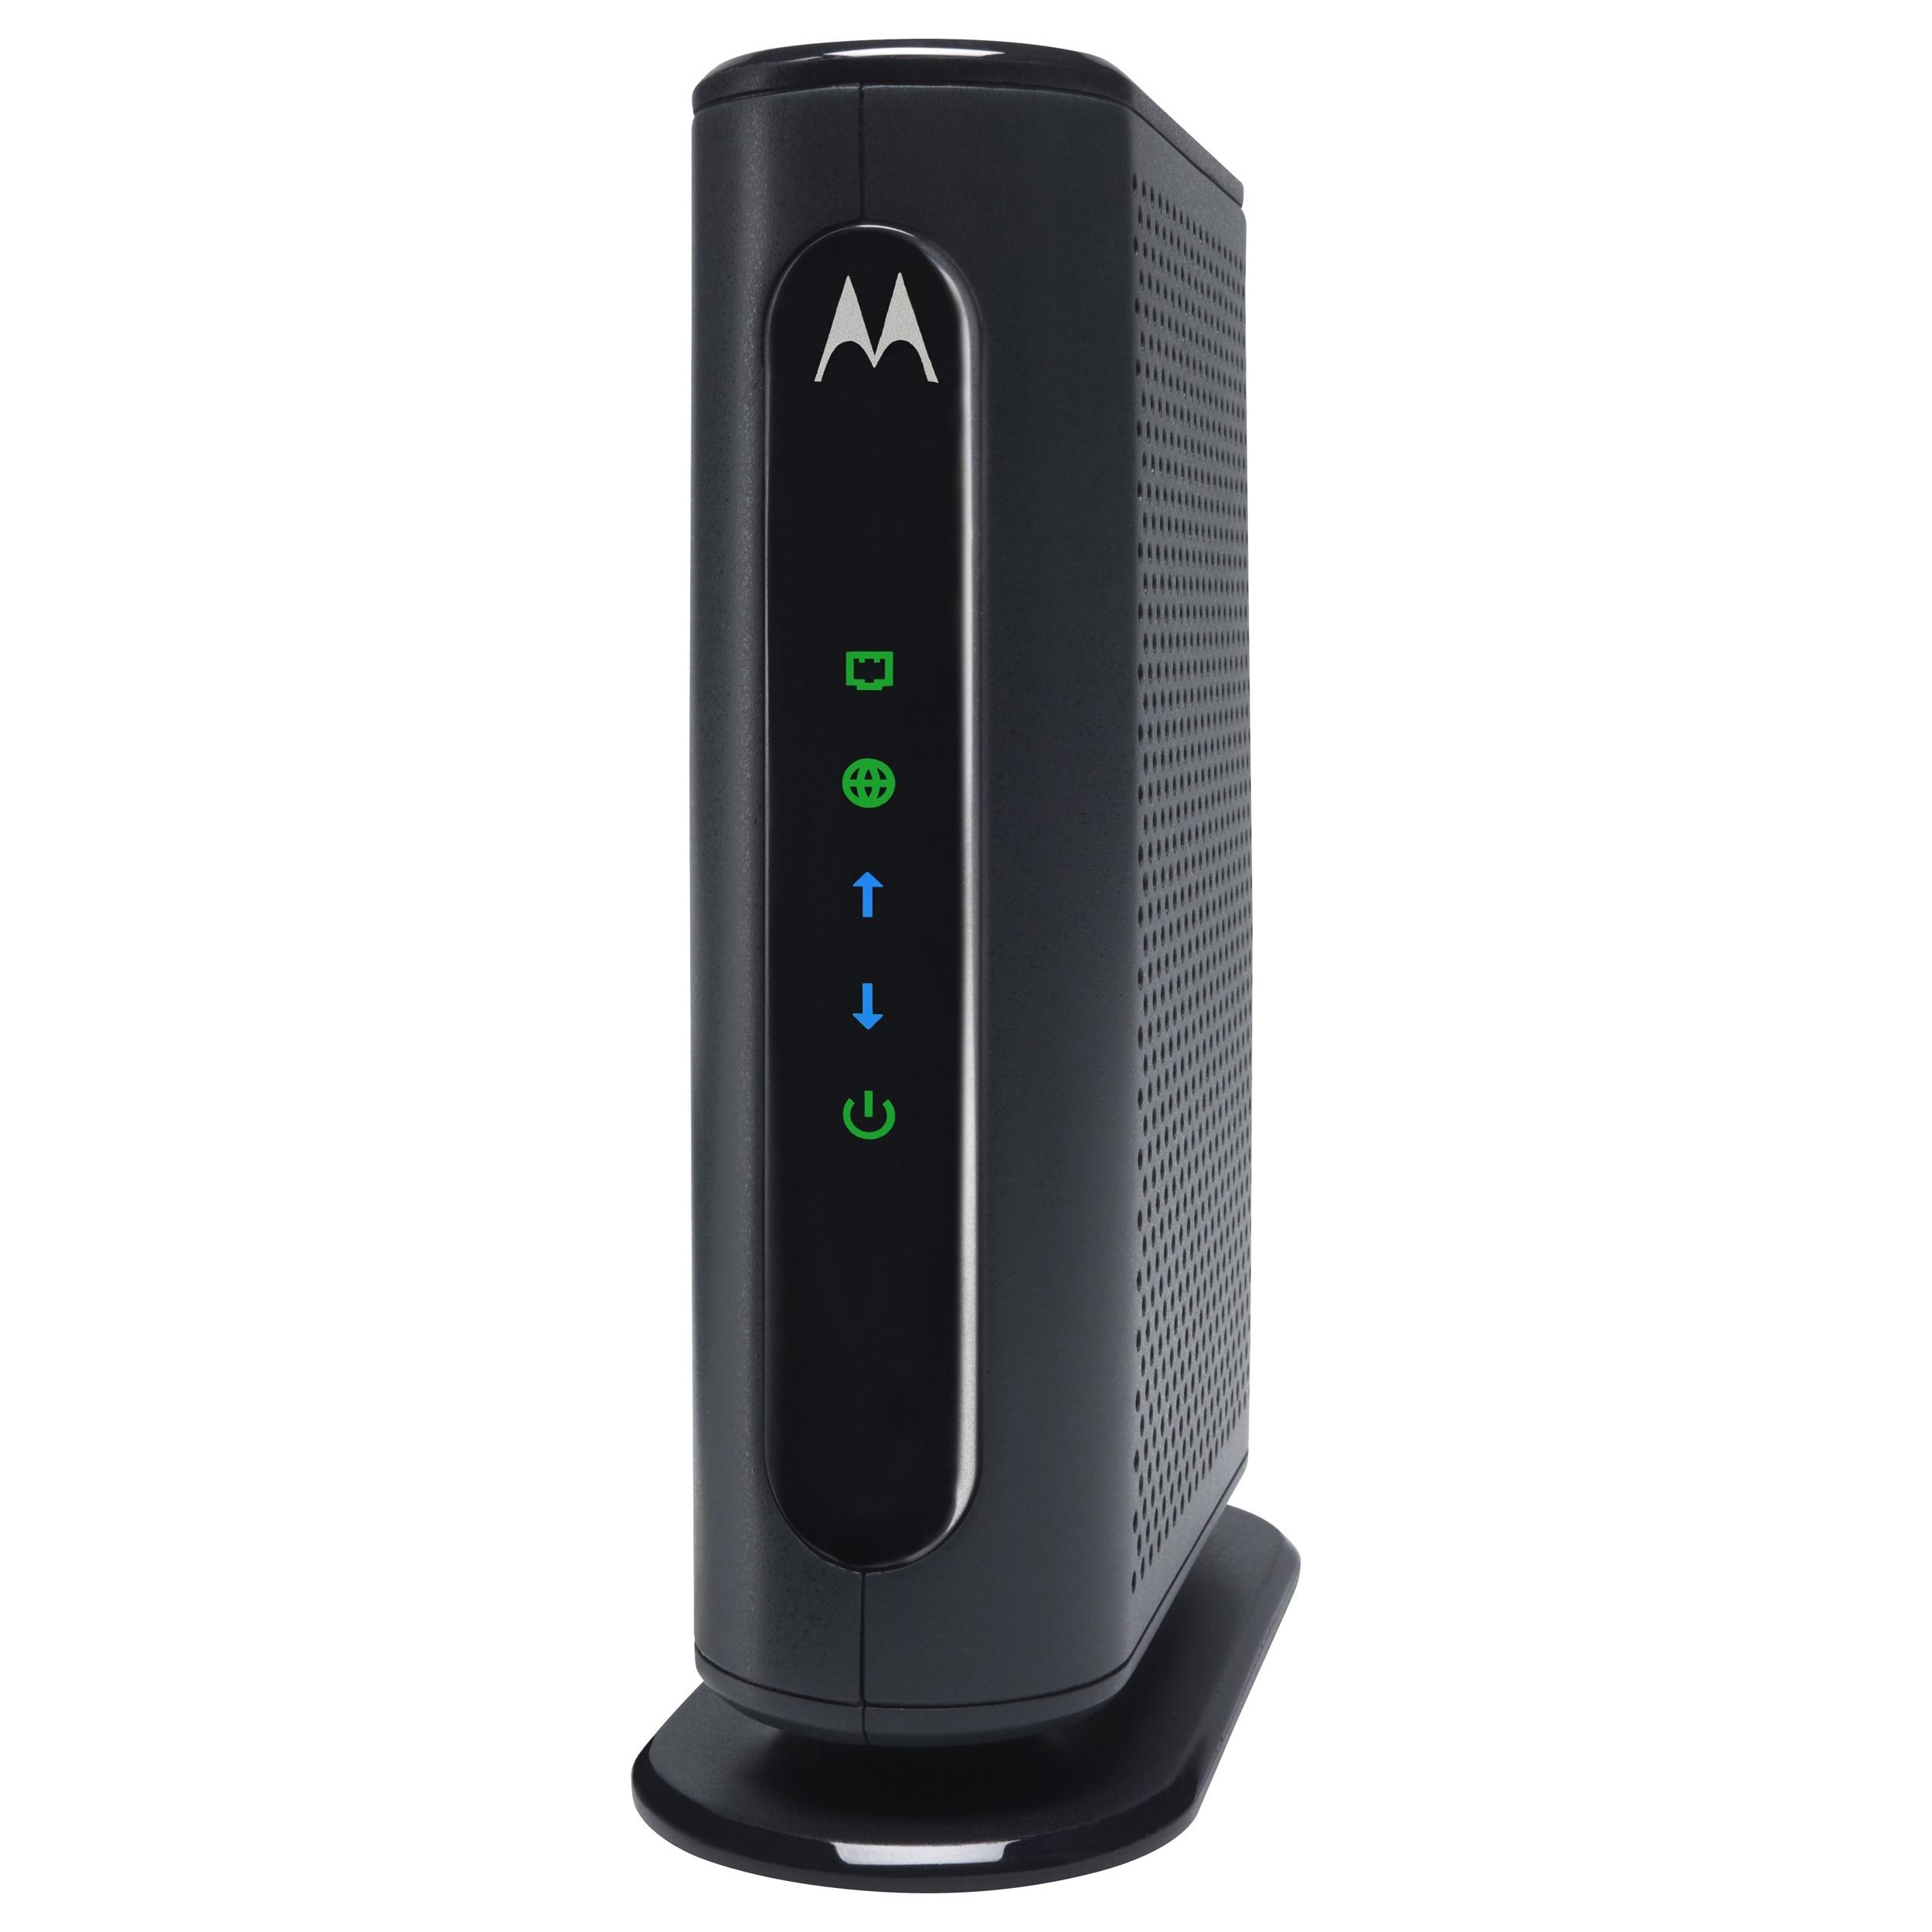 Motorola MB7420 16x4 686 Mbps DOCSIS 3.0 Cable Modem